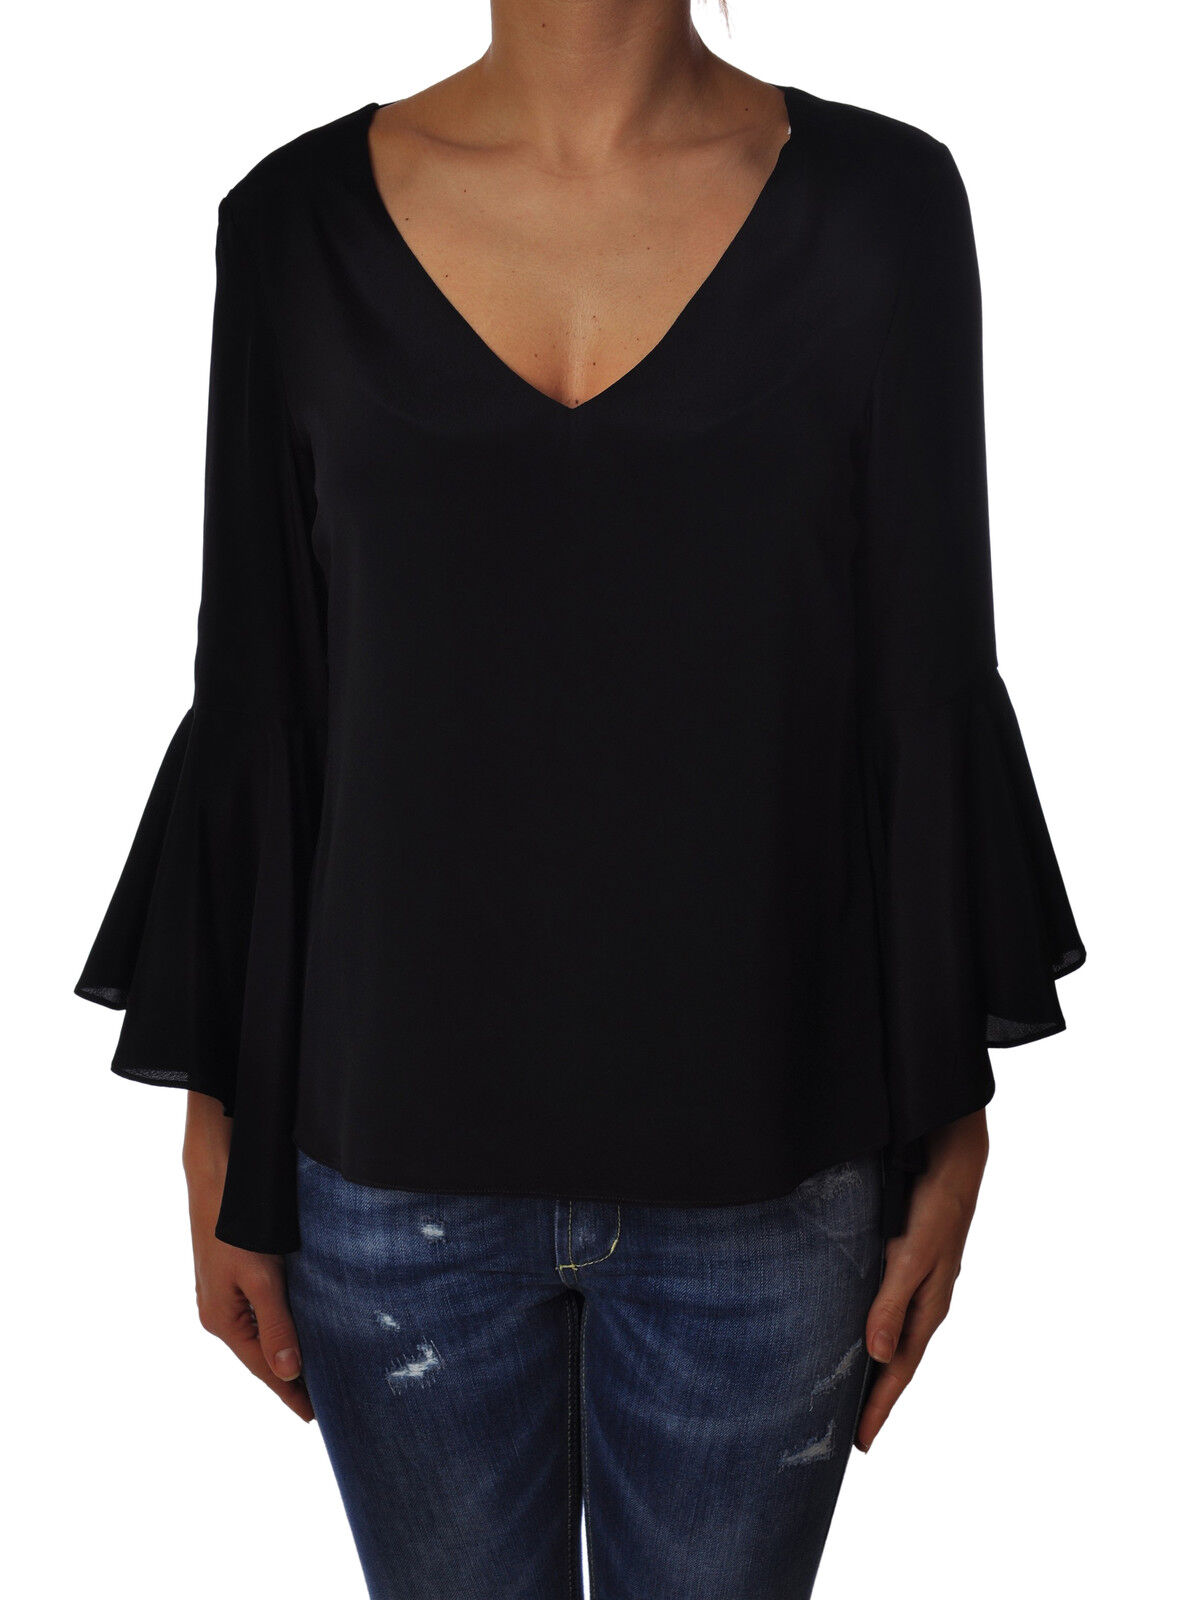 Dondup - Shirts-Blouses - Woman - bluee - 3106108E190839